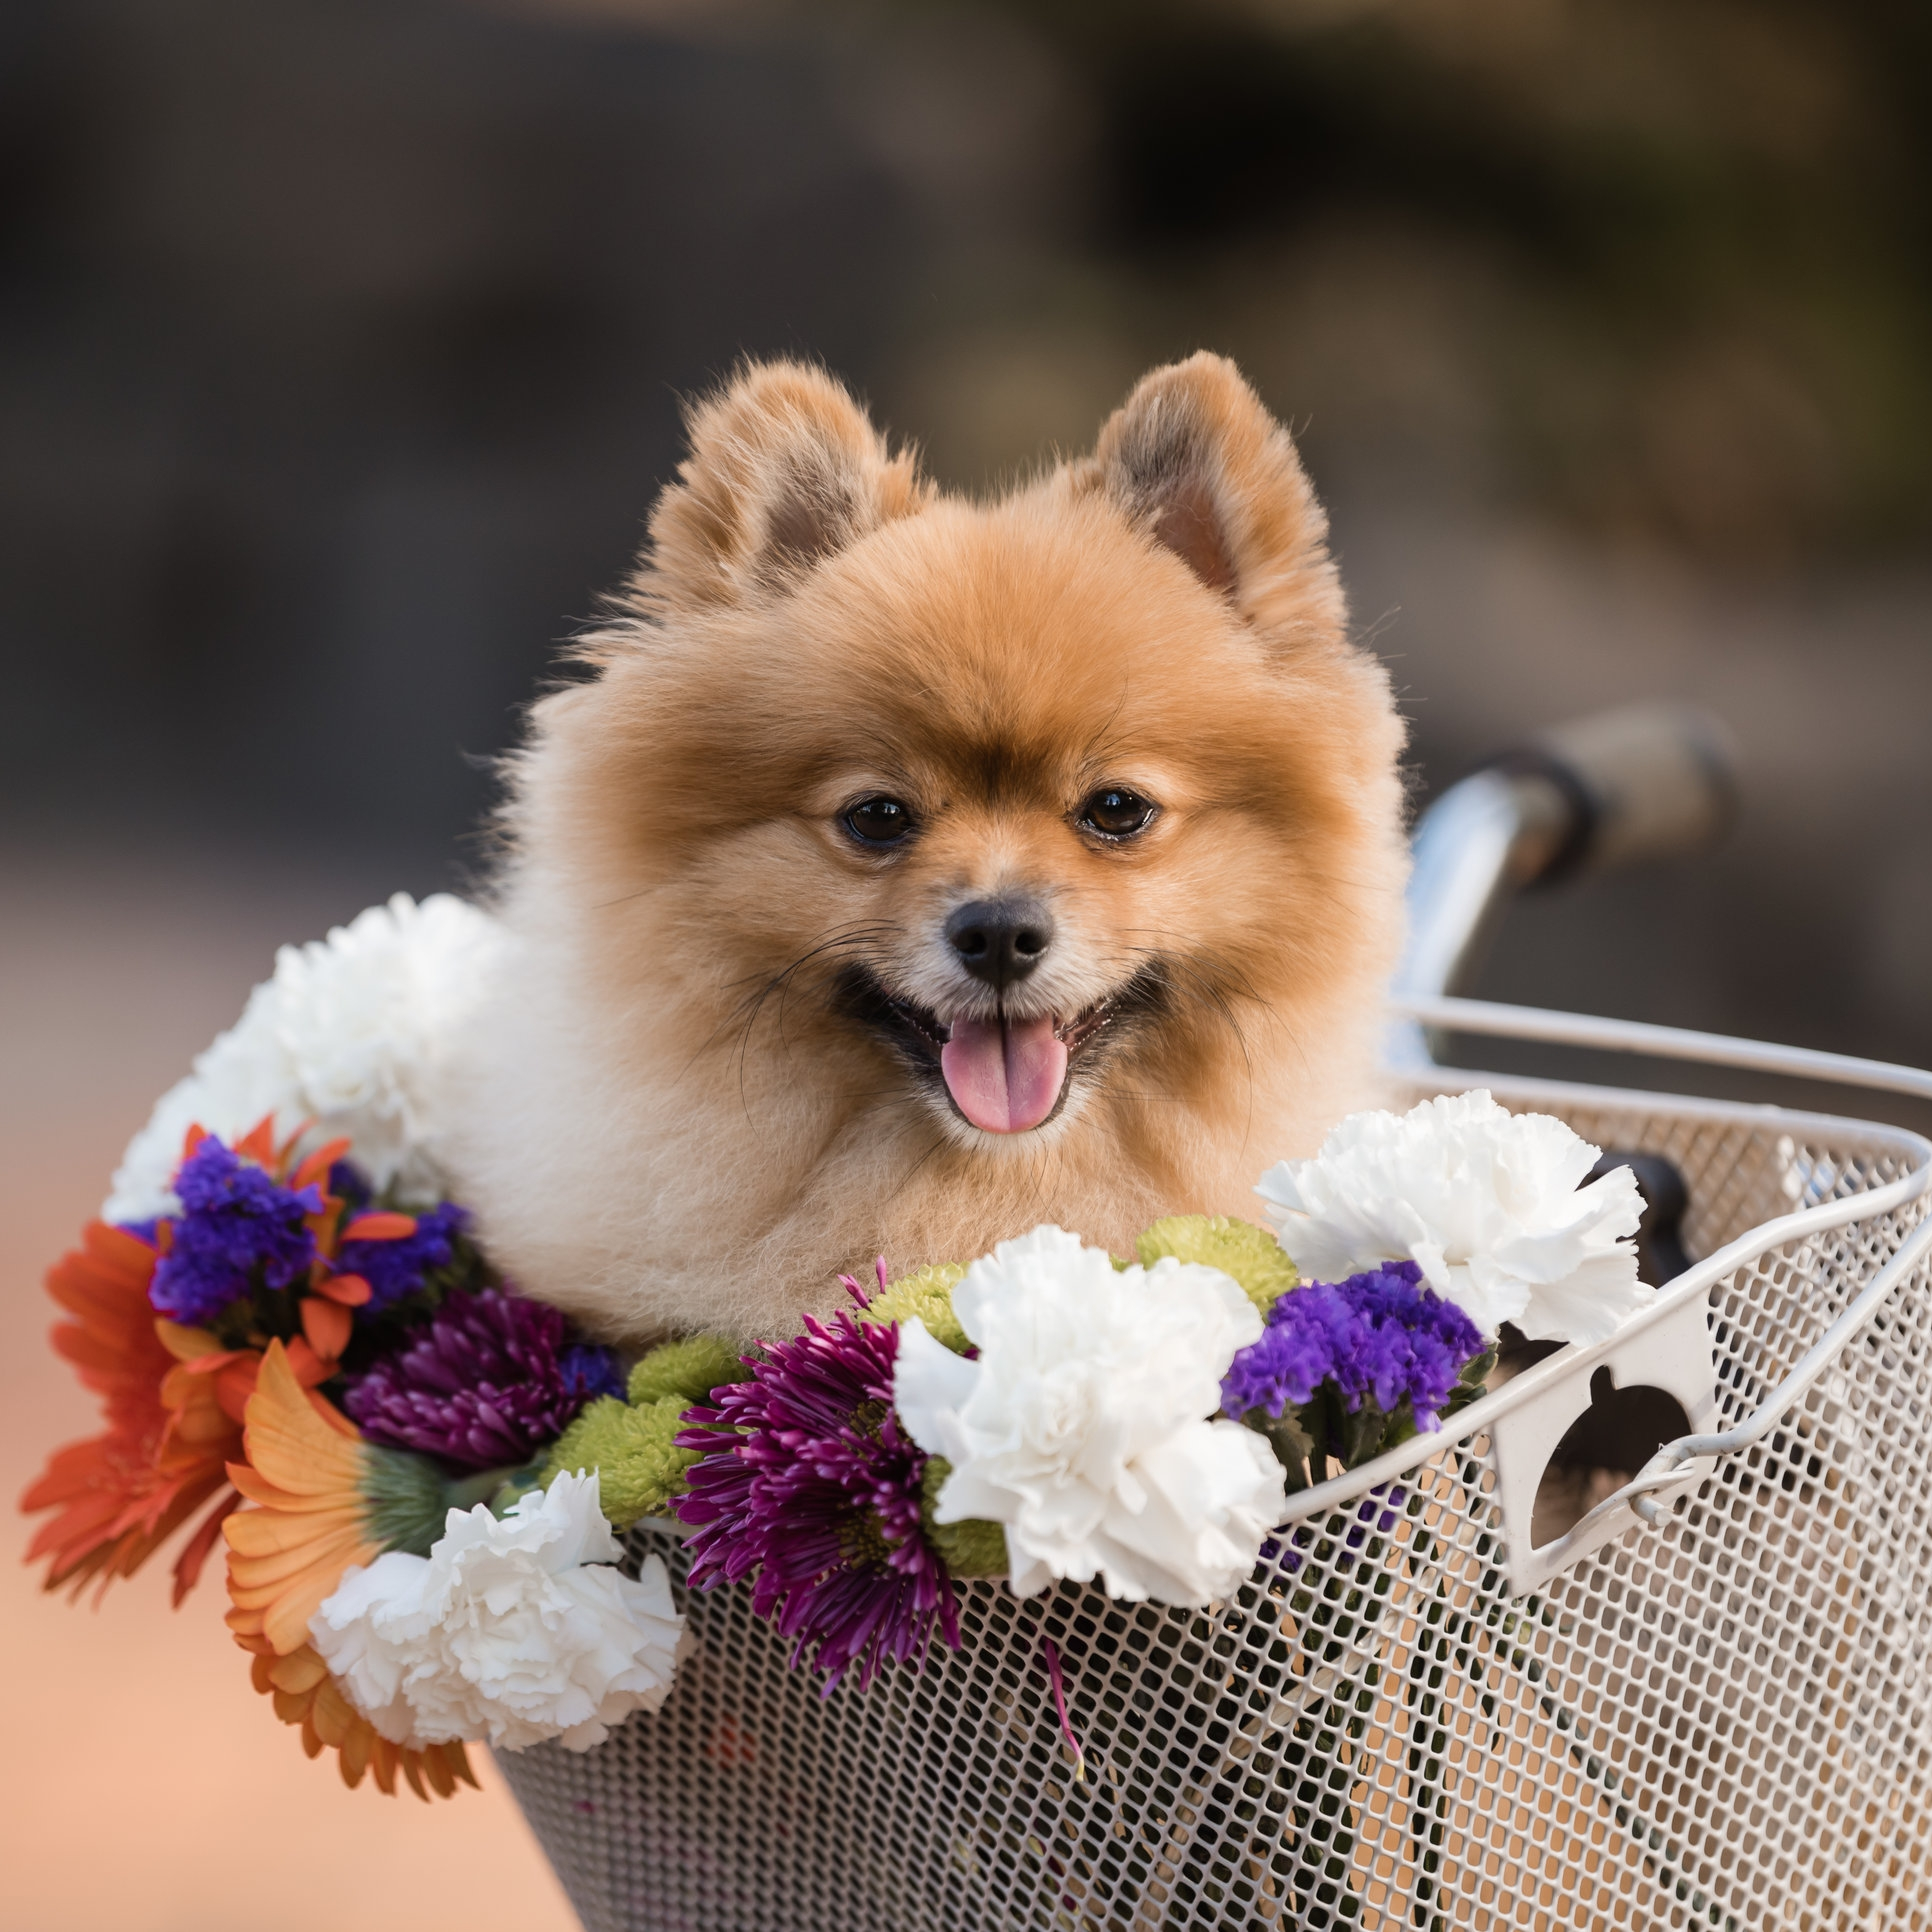 03-March-Pup-2.jpg